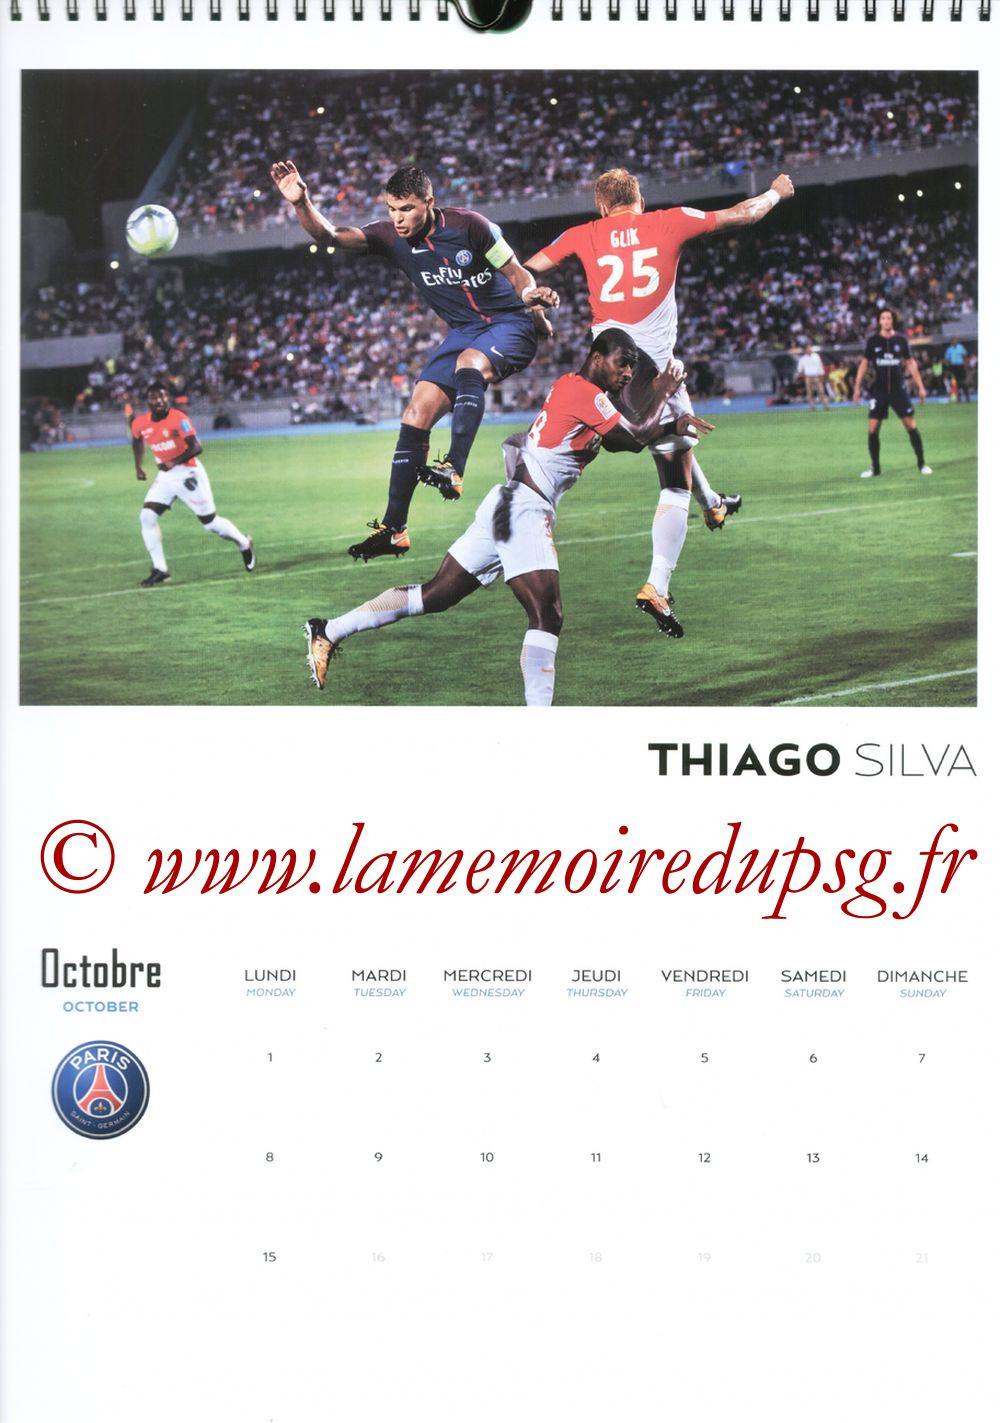 Calendrier PSG 2018 - Page 19 - Thiago SILVA